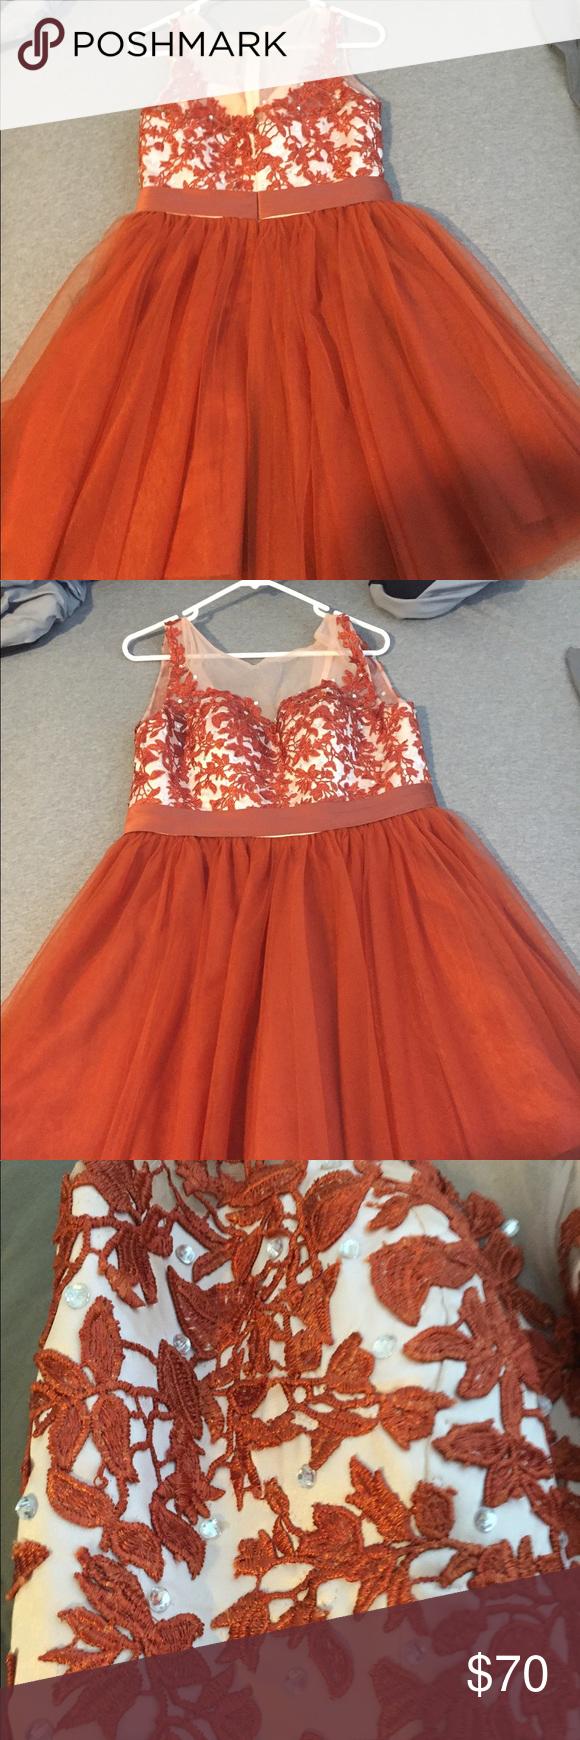 Burnt orange short prom dress beautiful short burnt orange prom